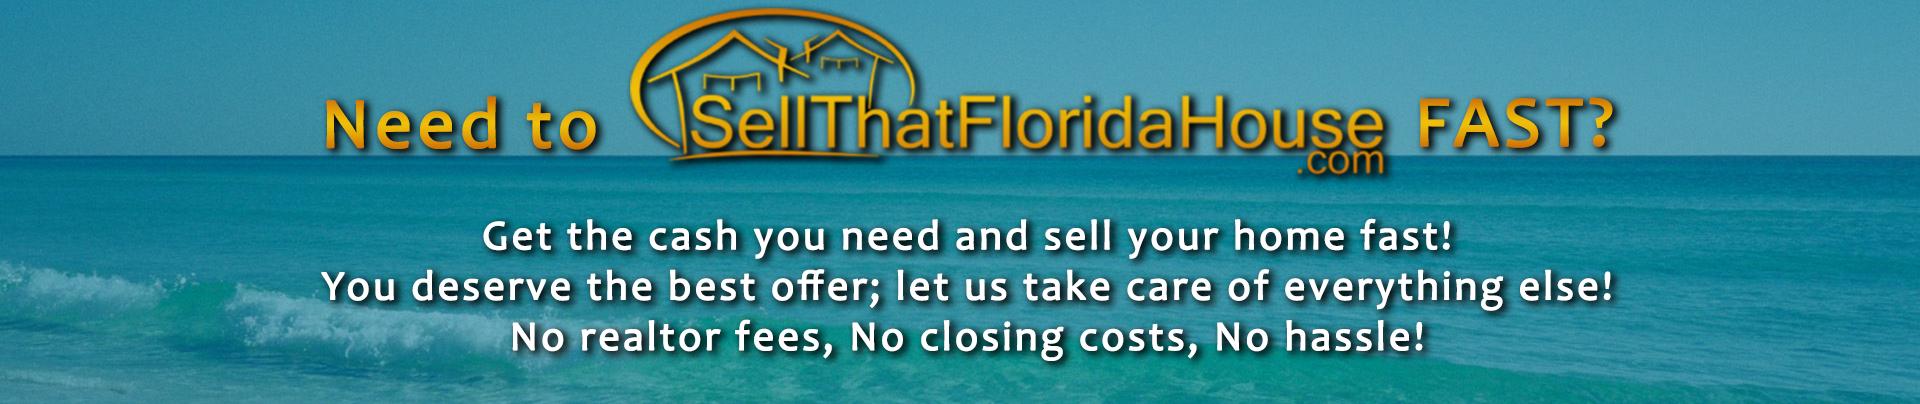 We Buy Houses Orlando | Sell My House Fast Orlando